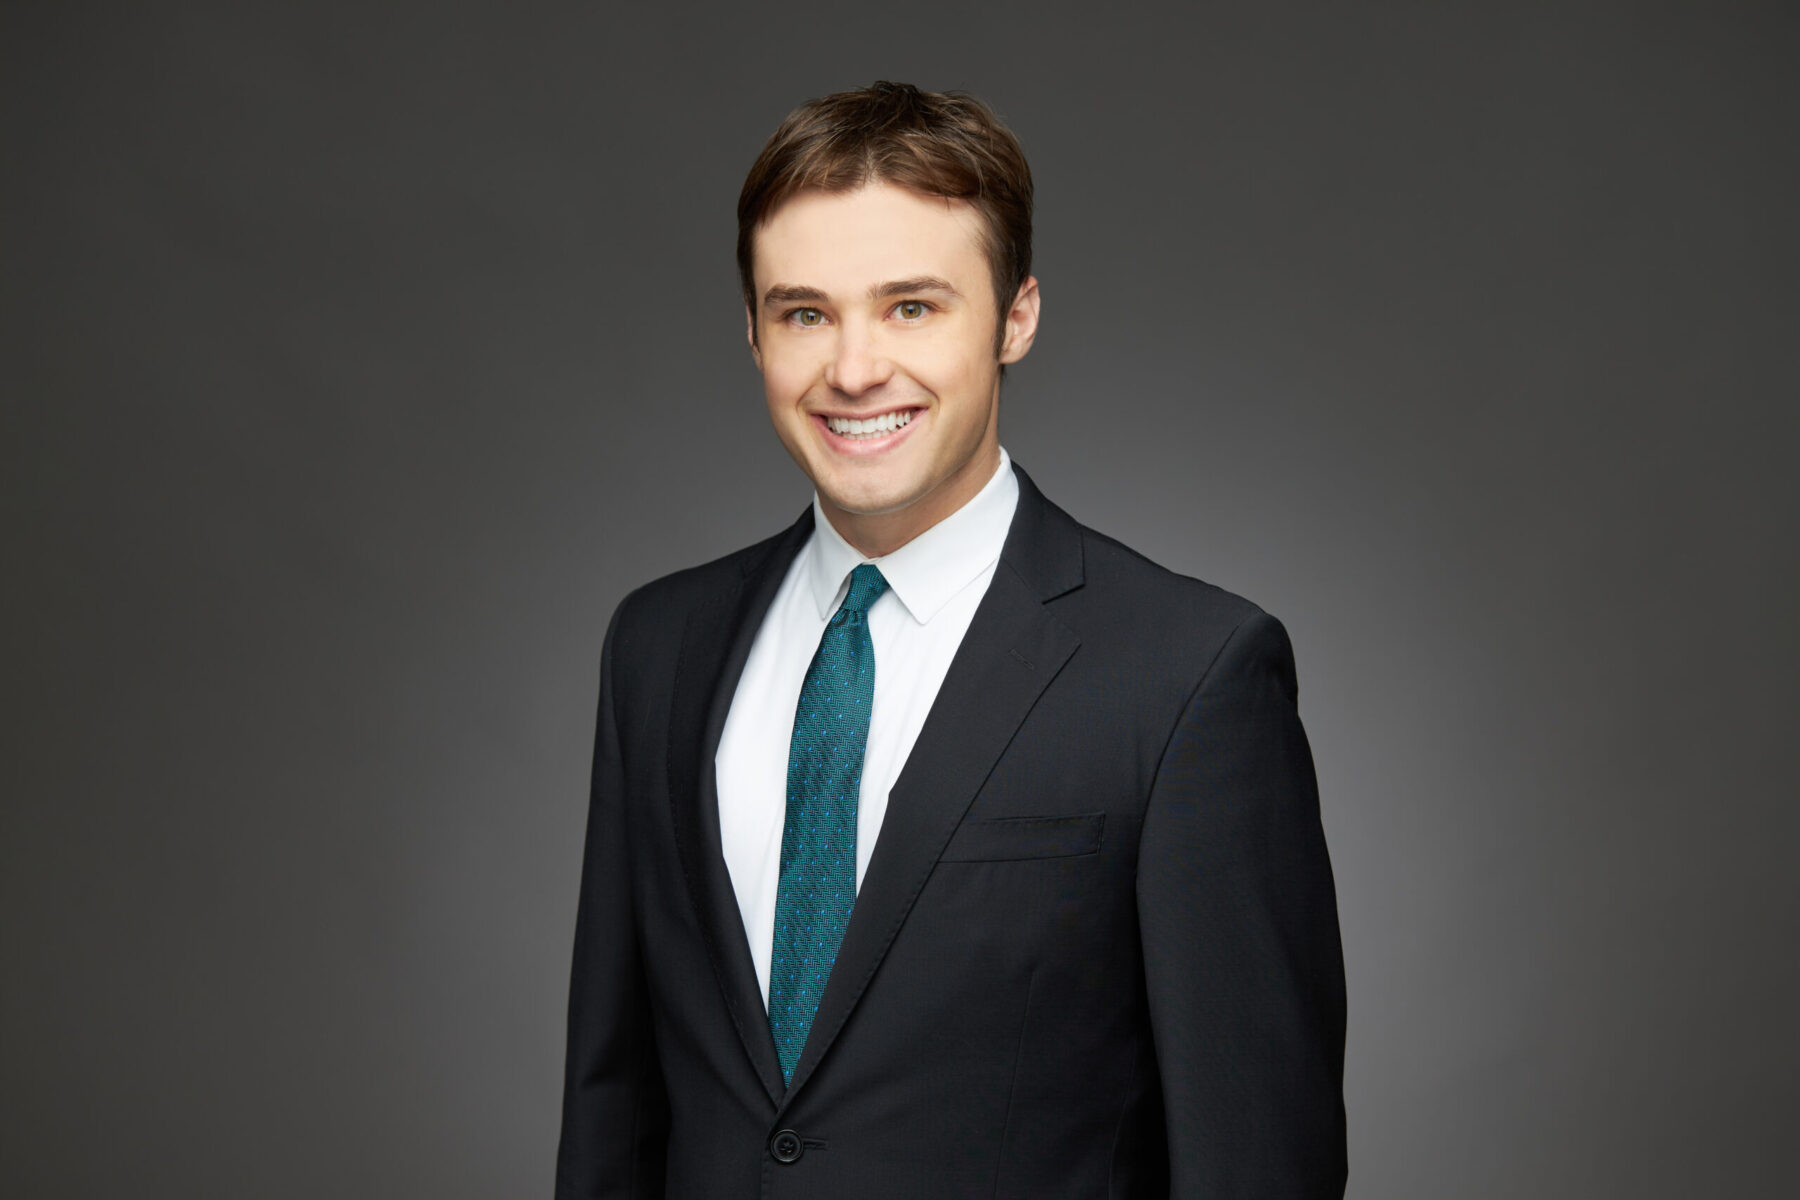 Joshua R. Hubbs